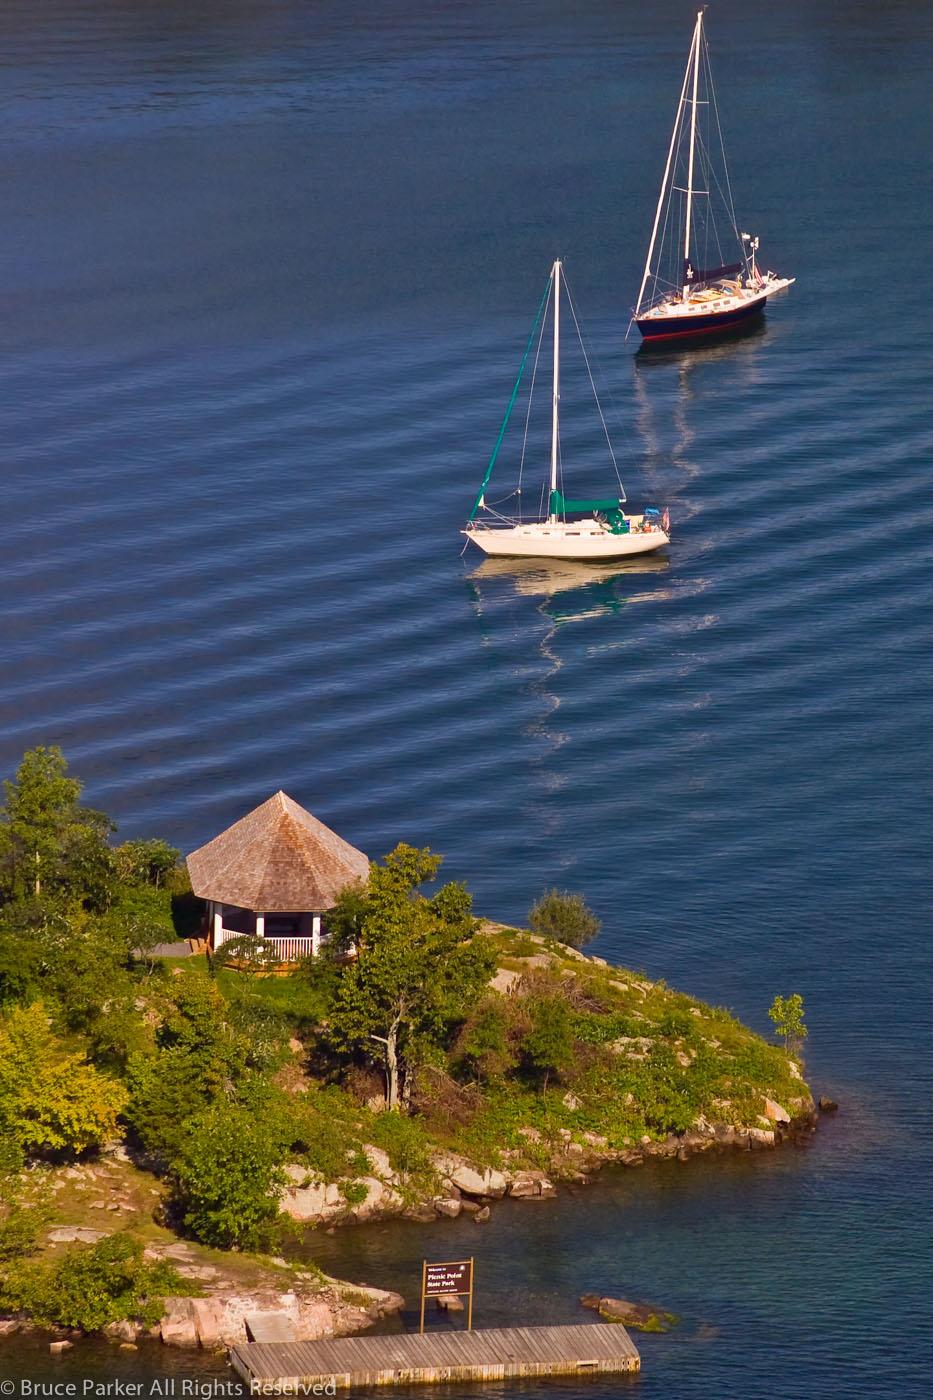 Sail Boats at Rest